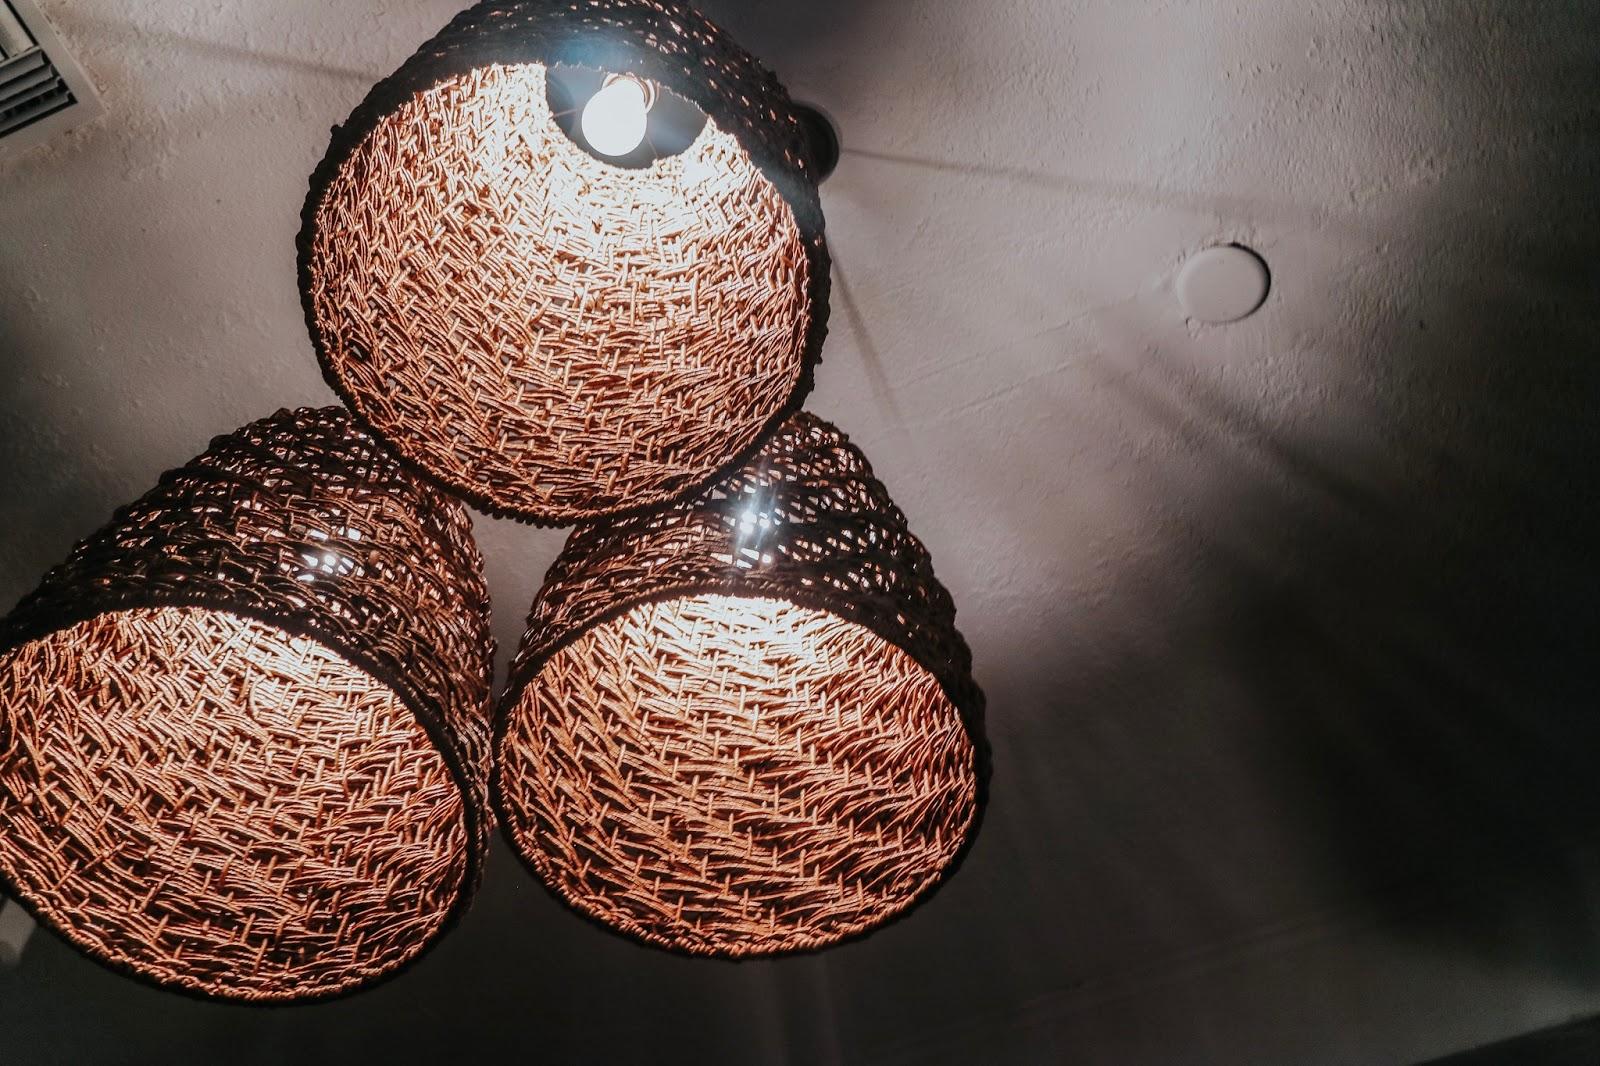 Woven basket light decor at boca in Tampa Florida